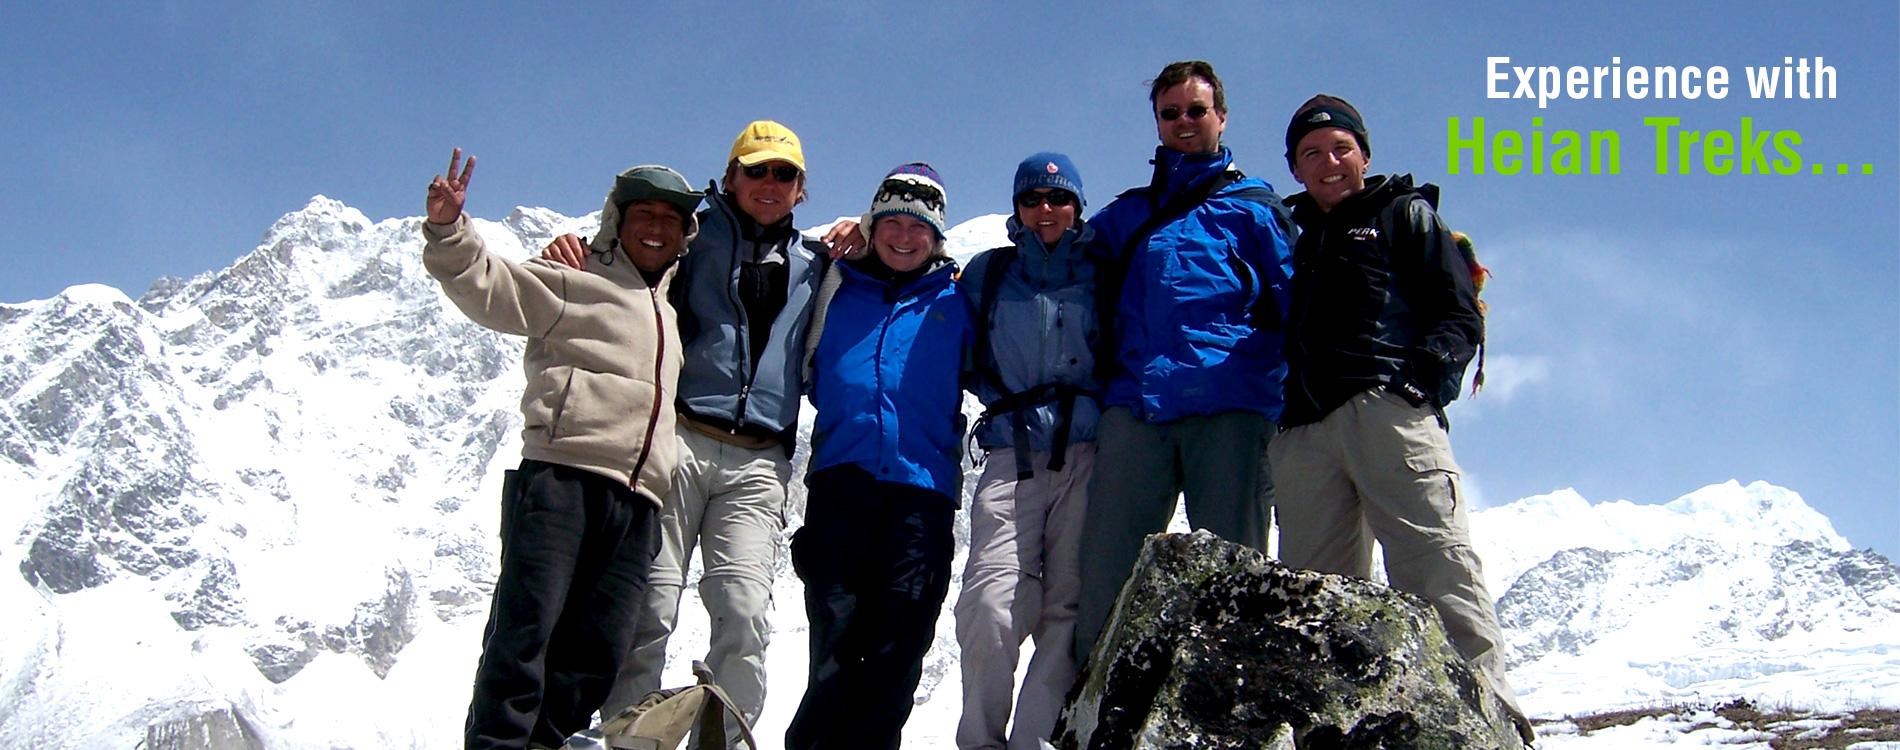 , Trekking in Nepal, Nepal Trekking, Best Trekking Company  in Nepal